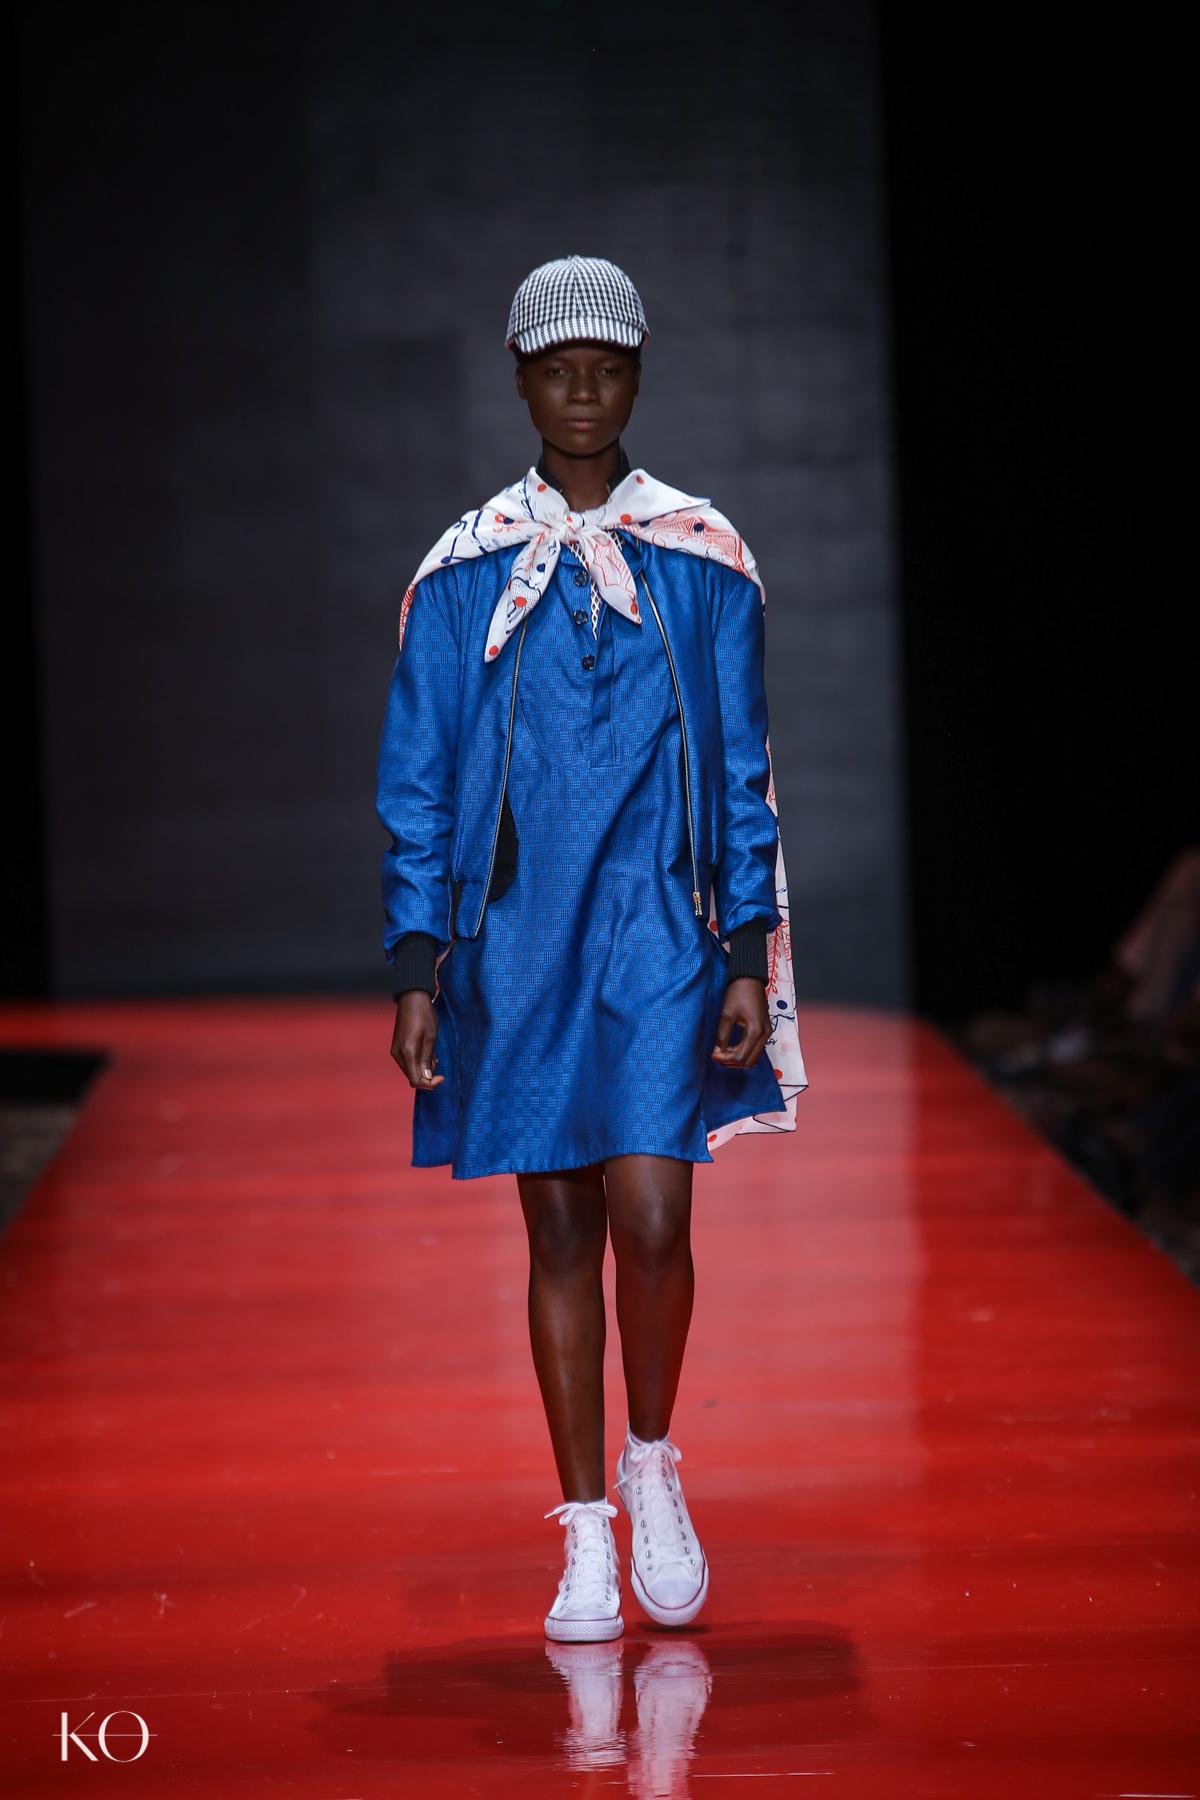 Full arise fashion week 2018 ozwald boateng 15